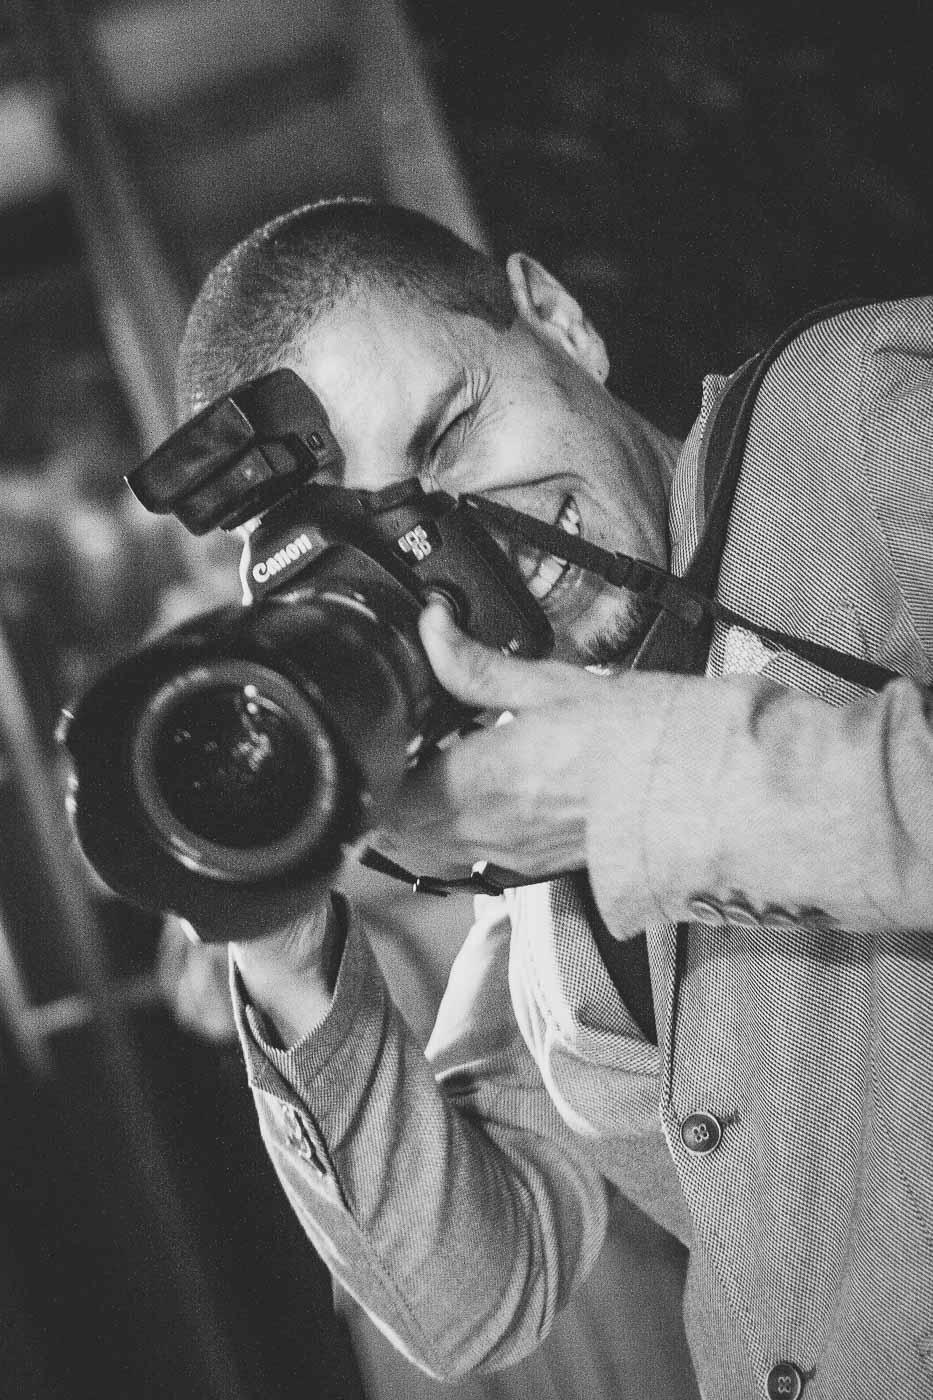 michele-ruffaldi-santori-at-work fotografo matrimoni